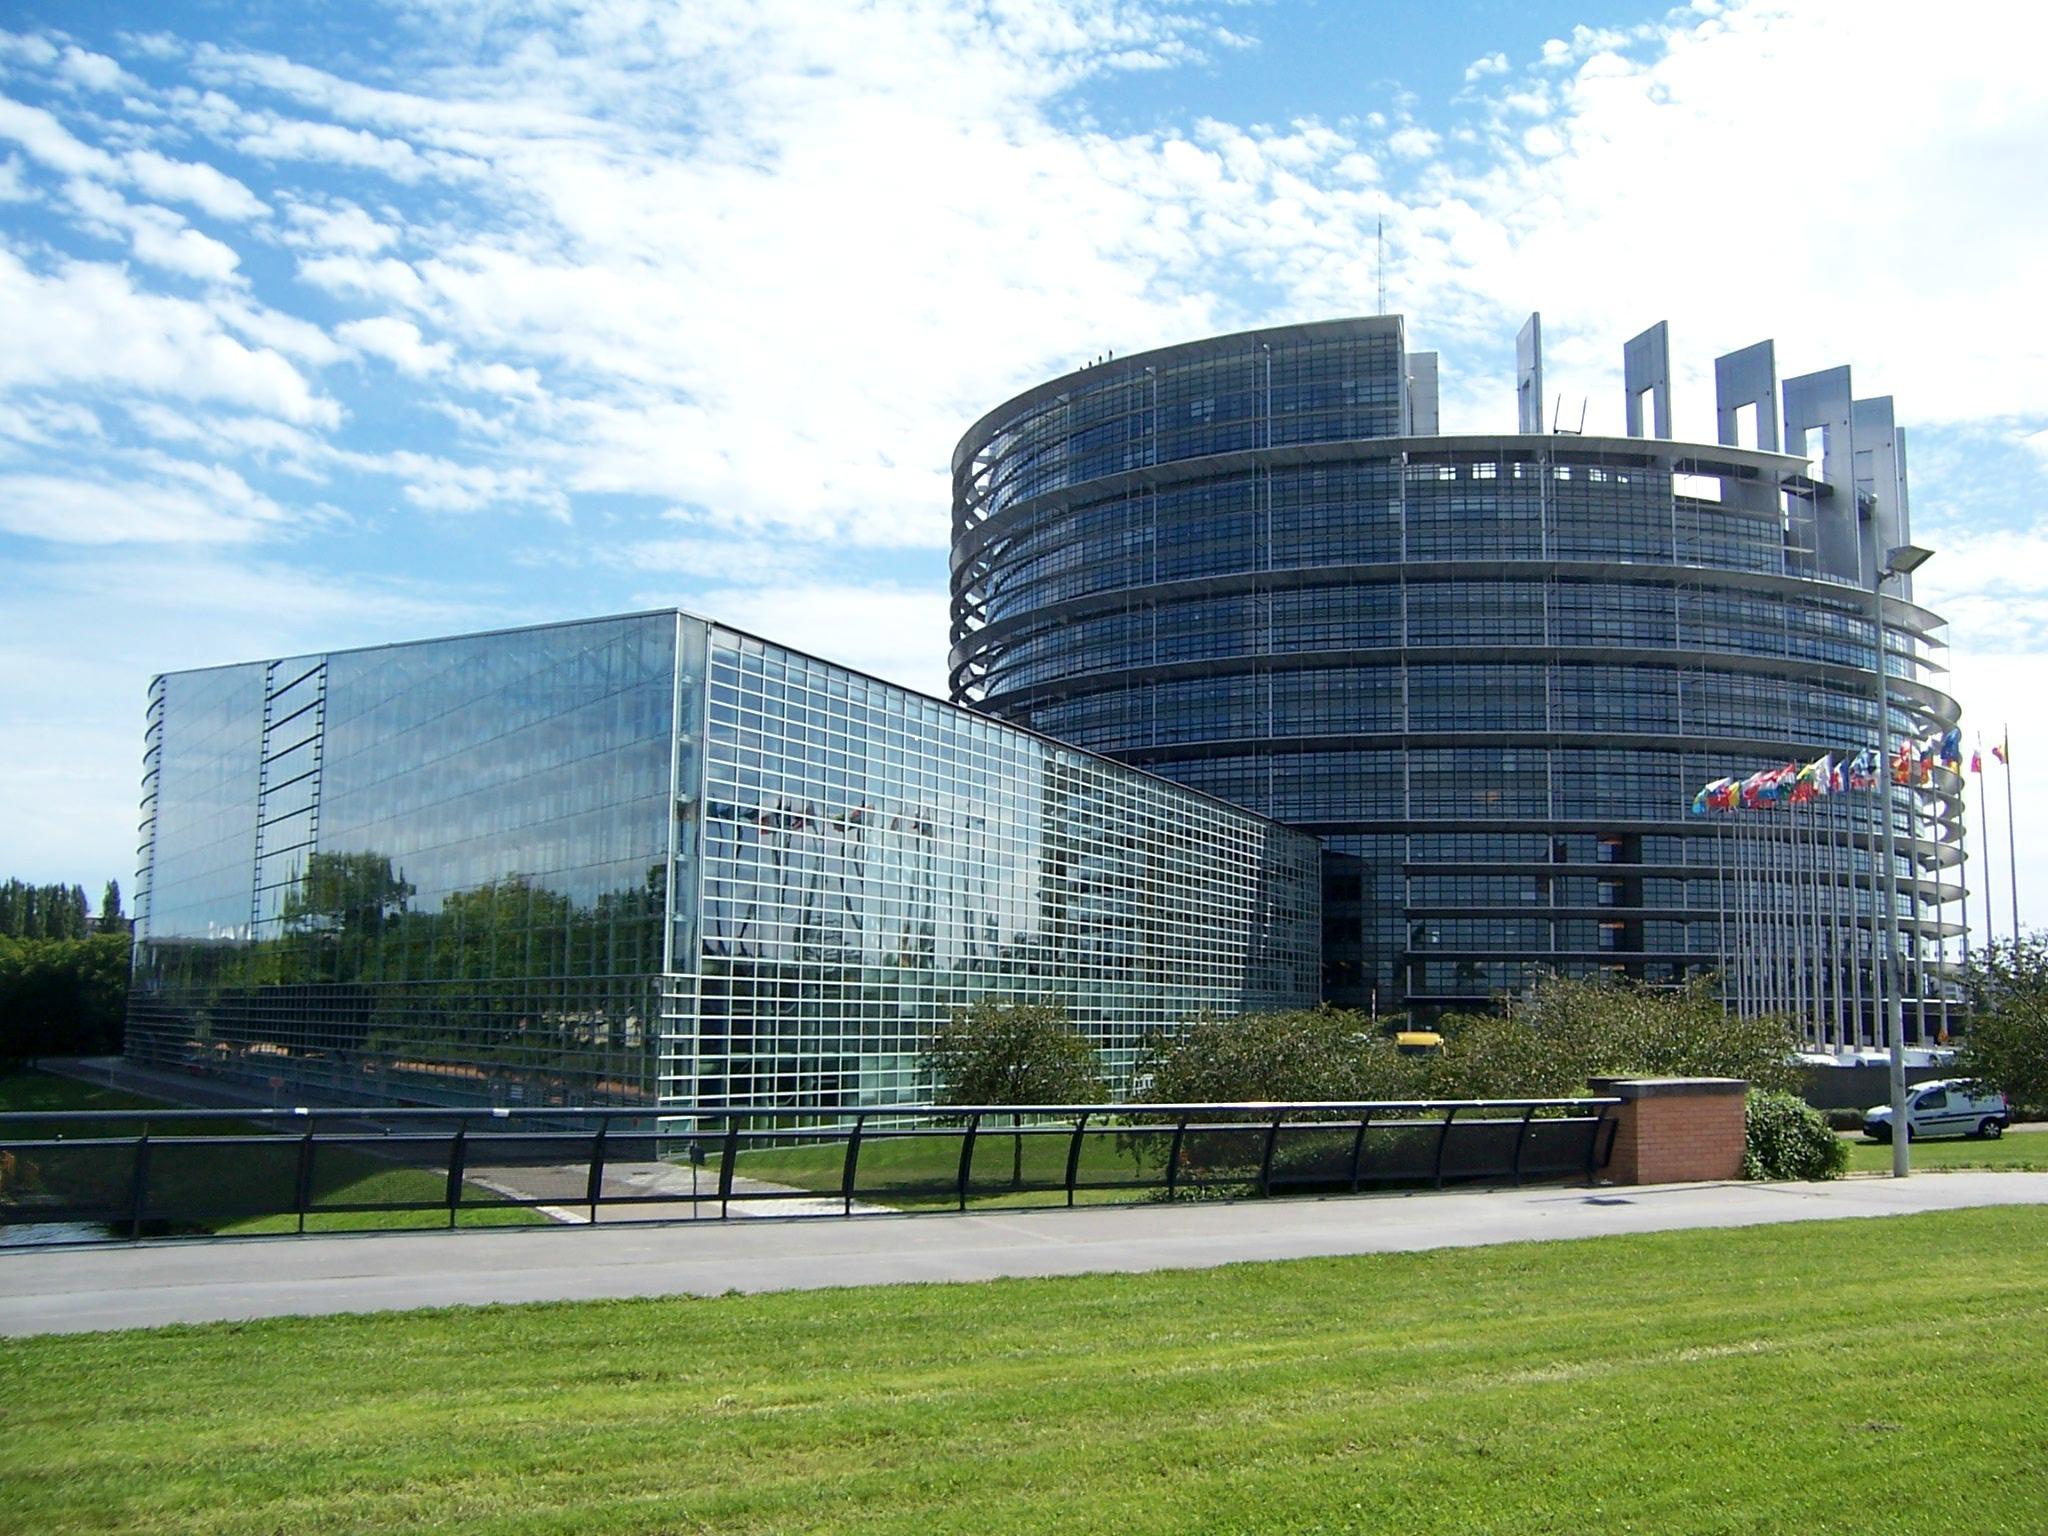 The European Parliament in Brussels, Belgium ( source )